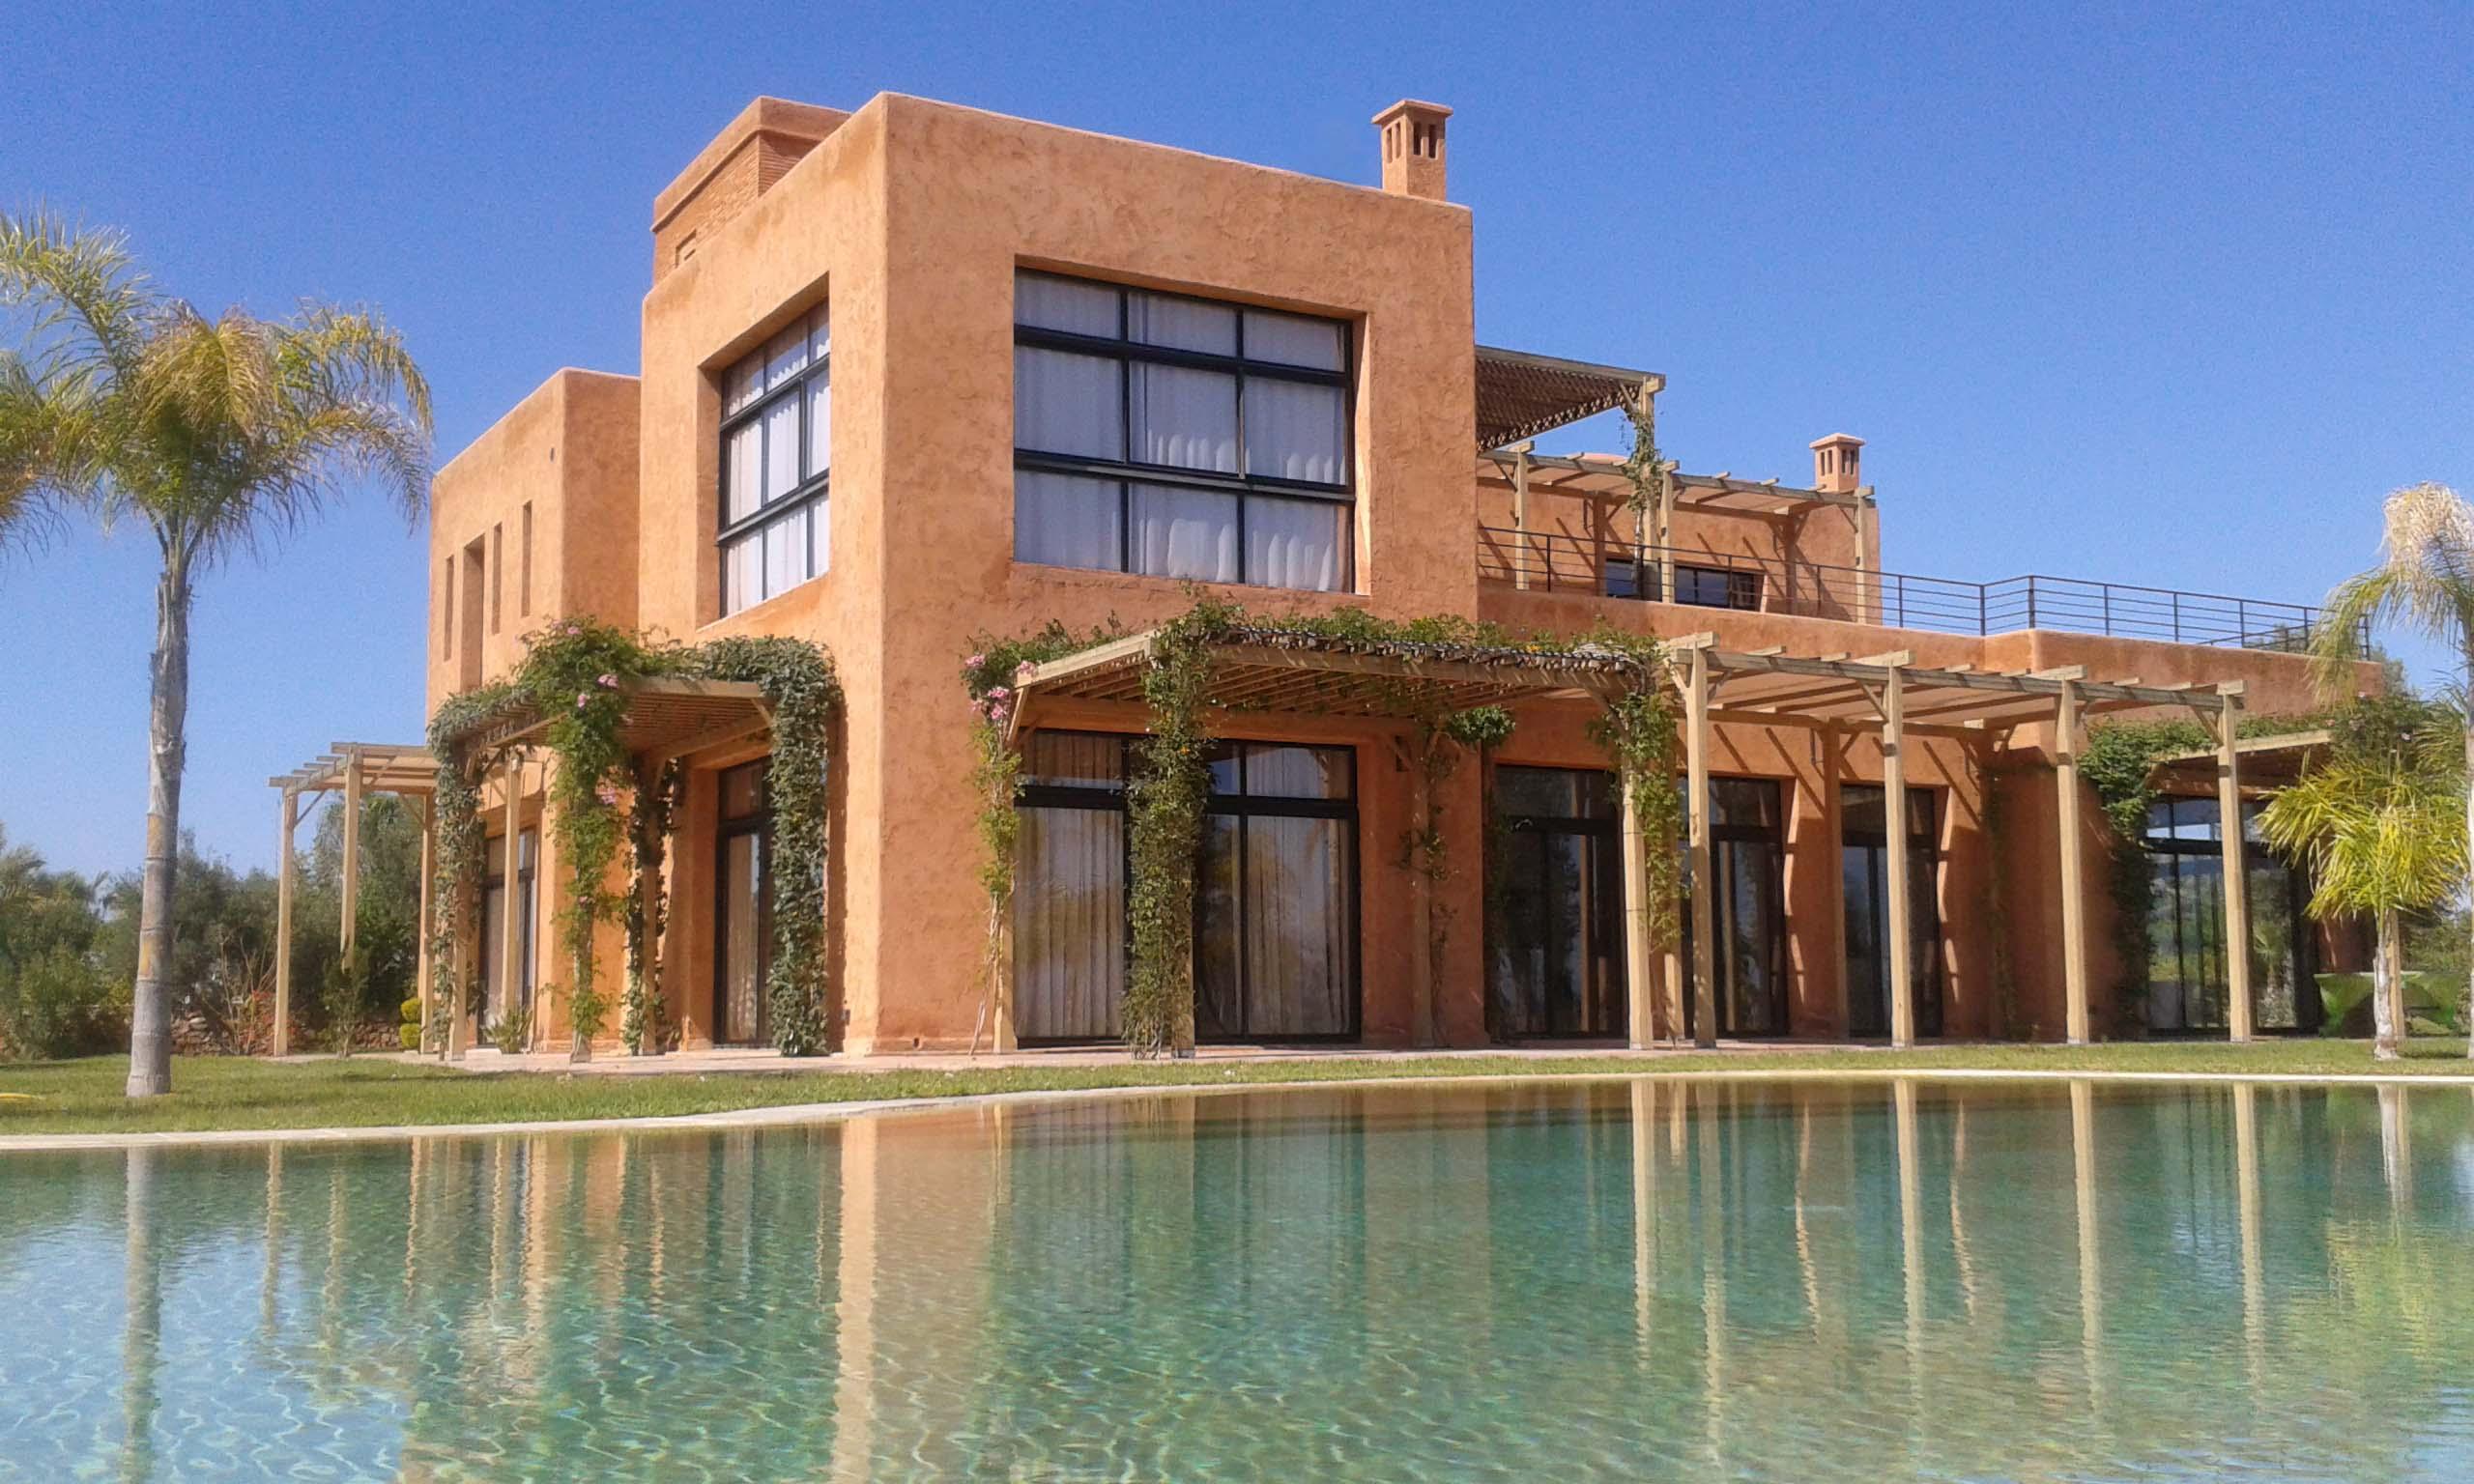 Vente villa marrakech villa de luxe vendre route d for A vendre villa de luxe